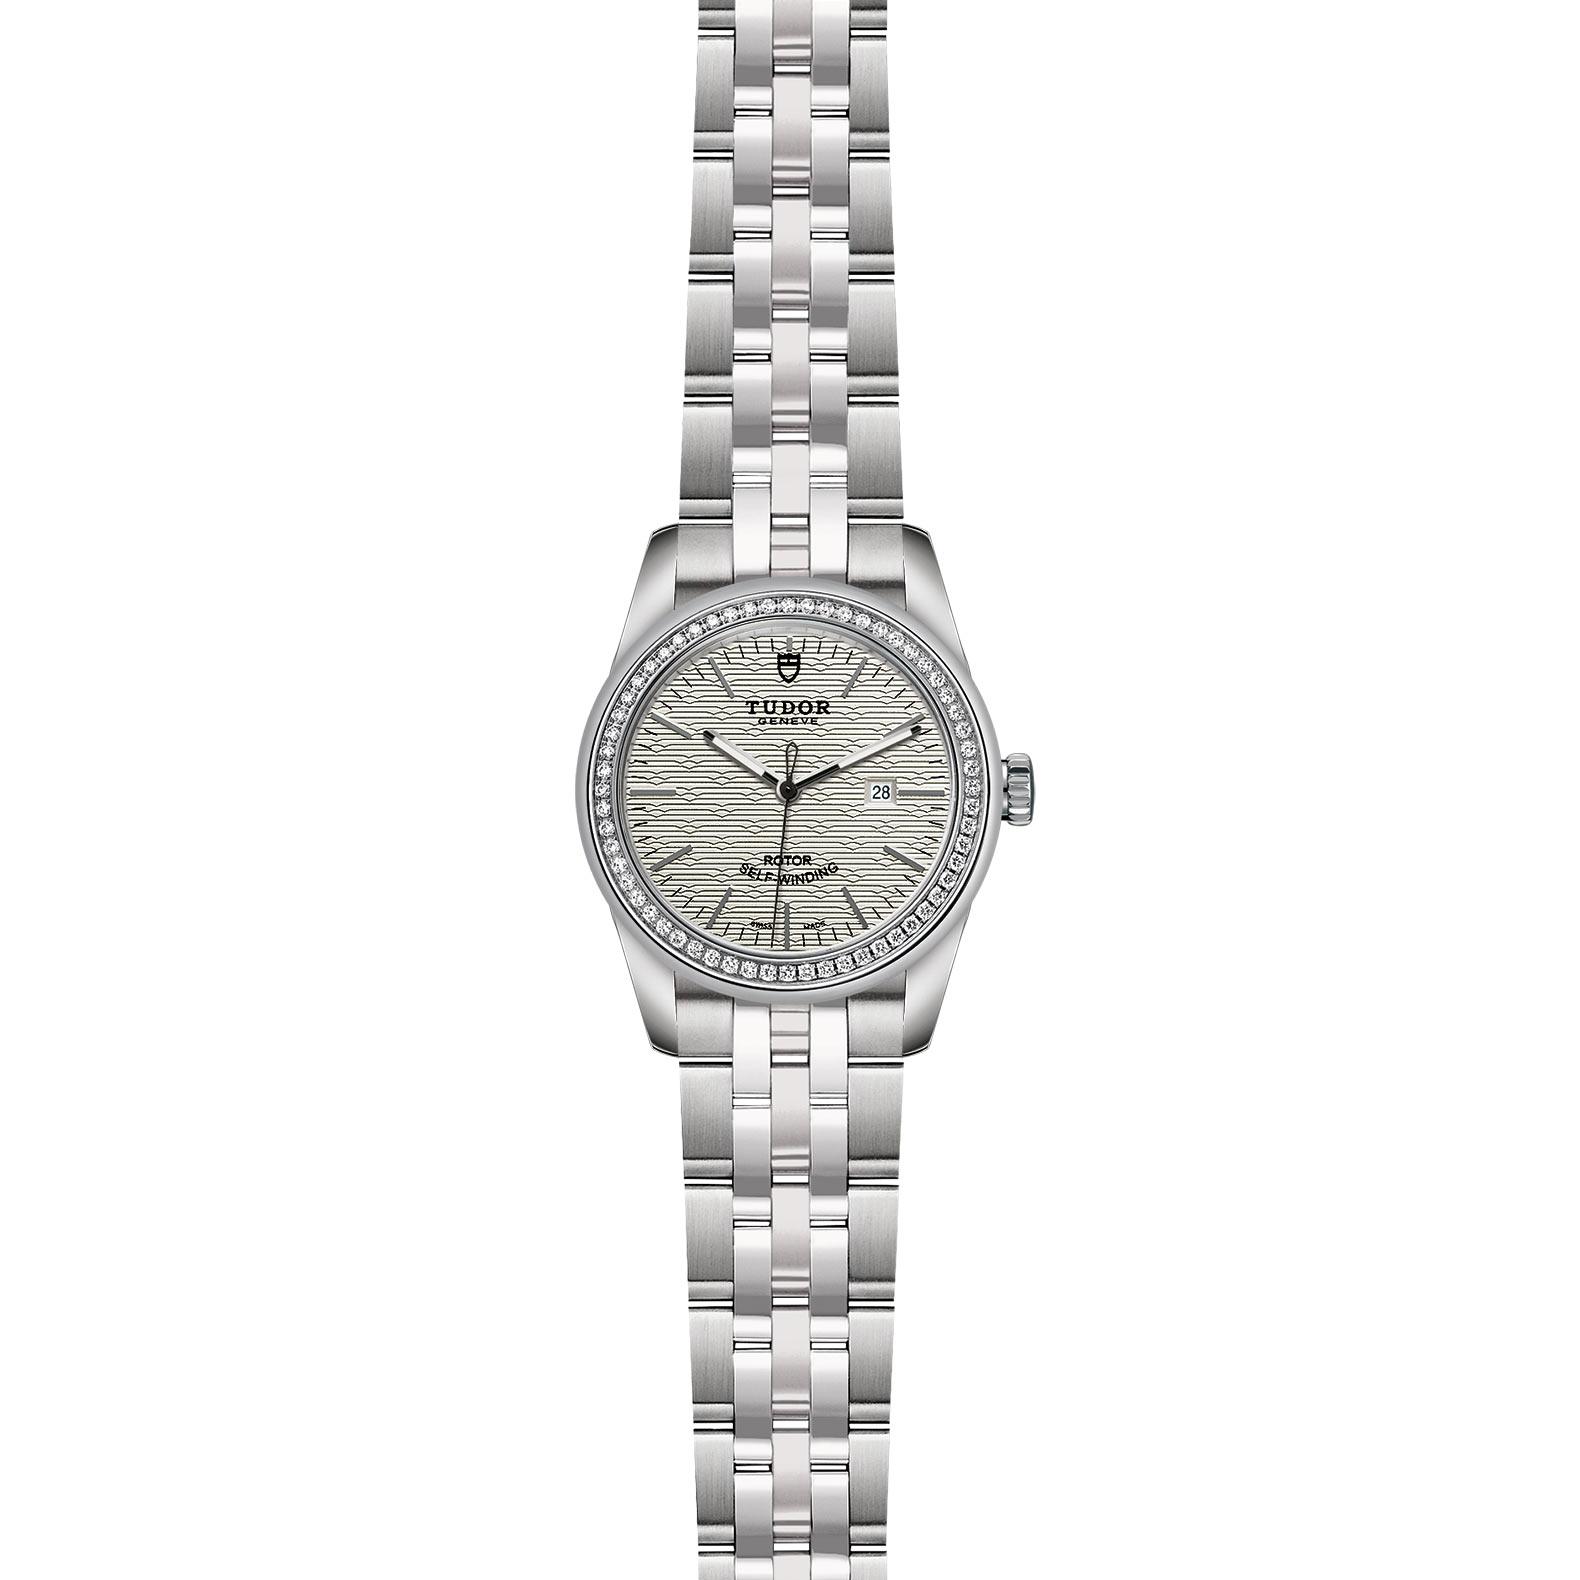 TUDOR Glamour Date M53020 0001 Frontfacing